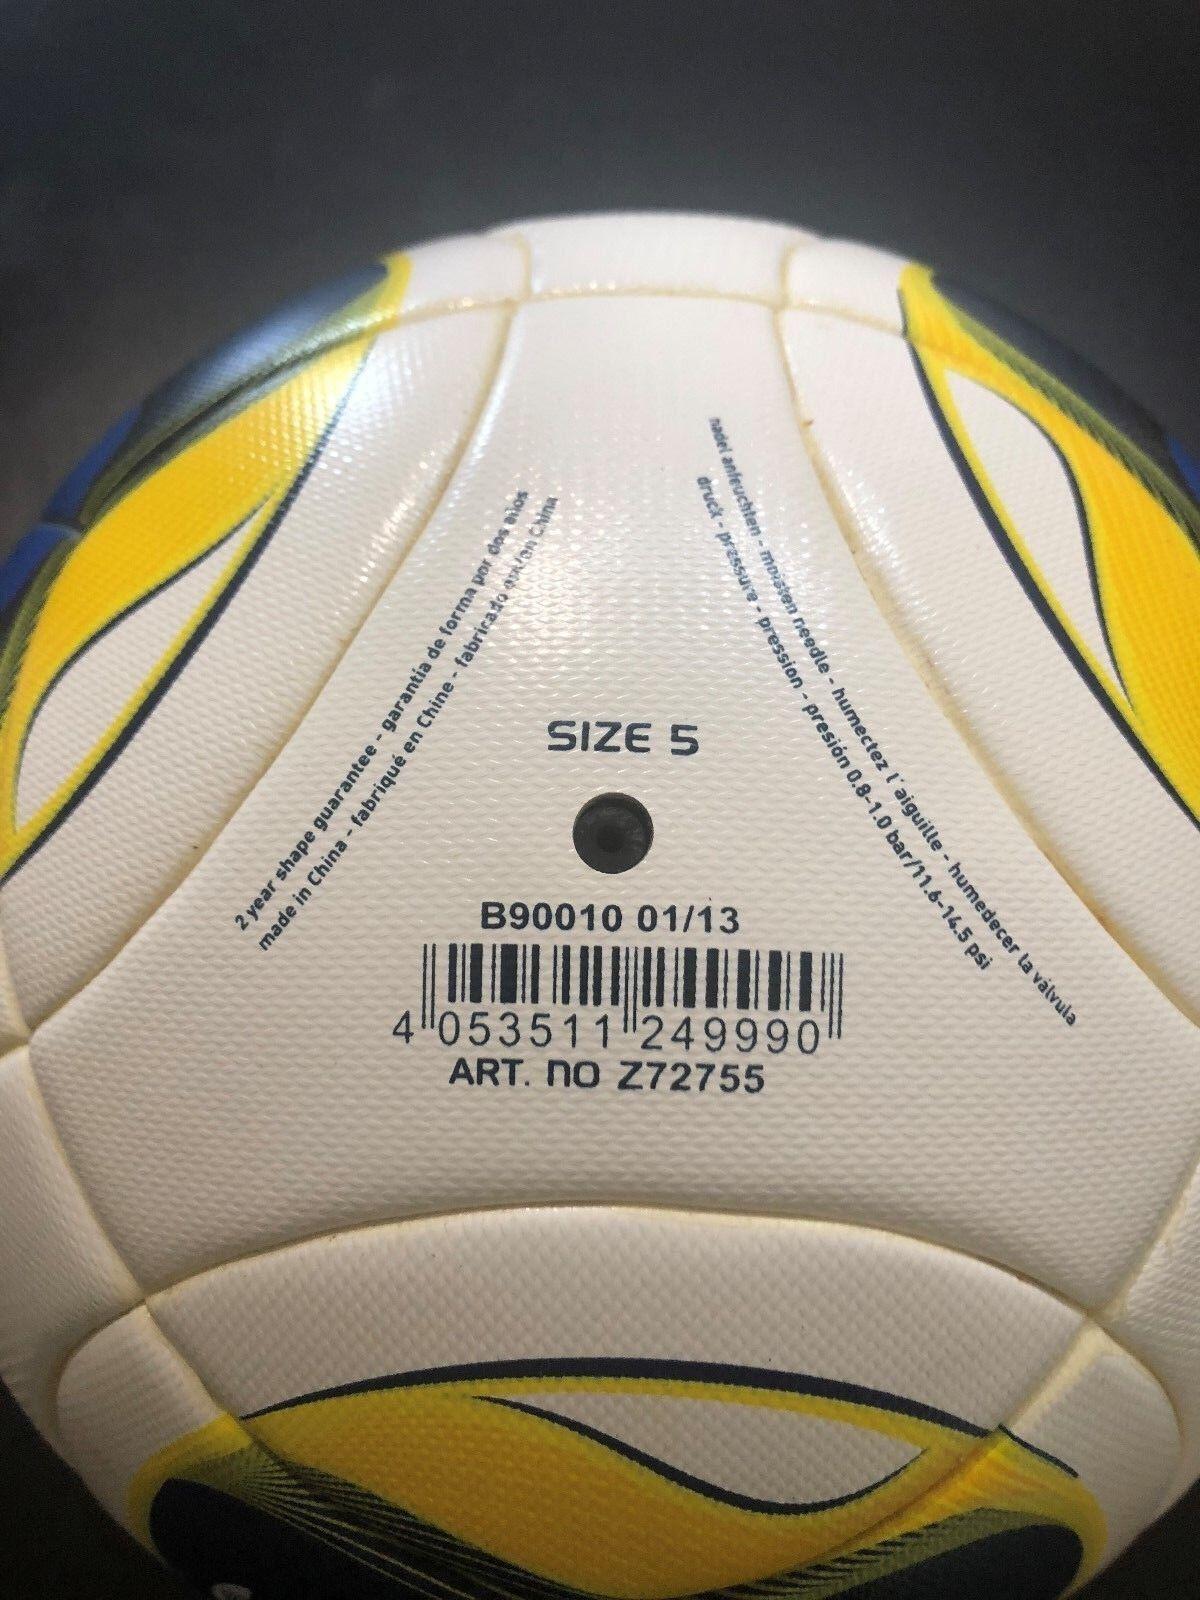 ADIDAS OFFICIAL OFFICIAL OFFICIAL MATCH BALL CAFUSA WOMEN'S WORLD CUP SWEDEN 2013 7f9292